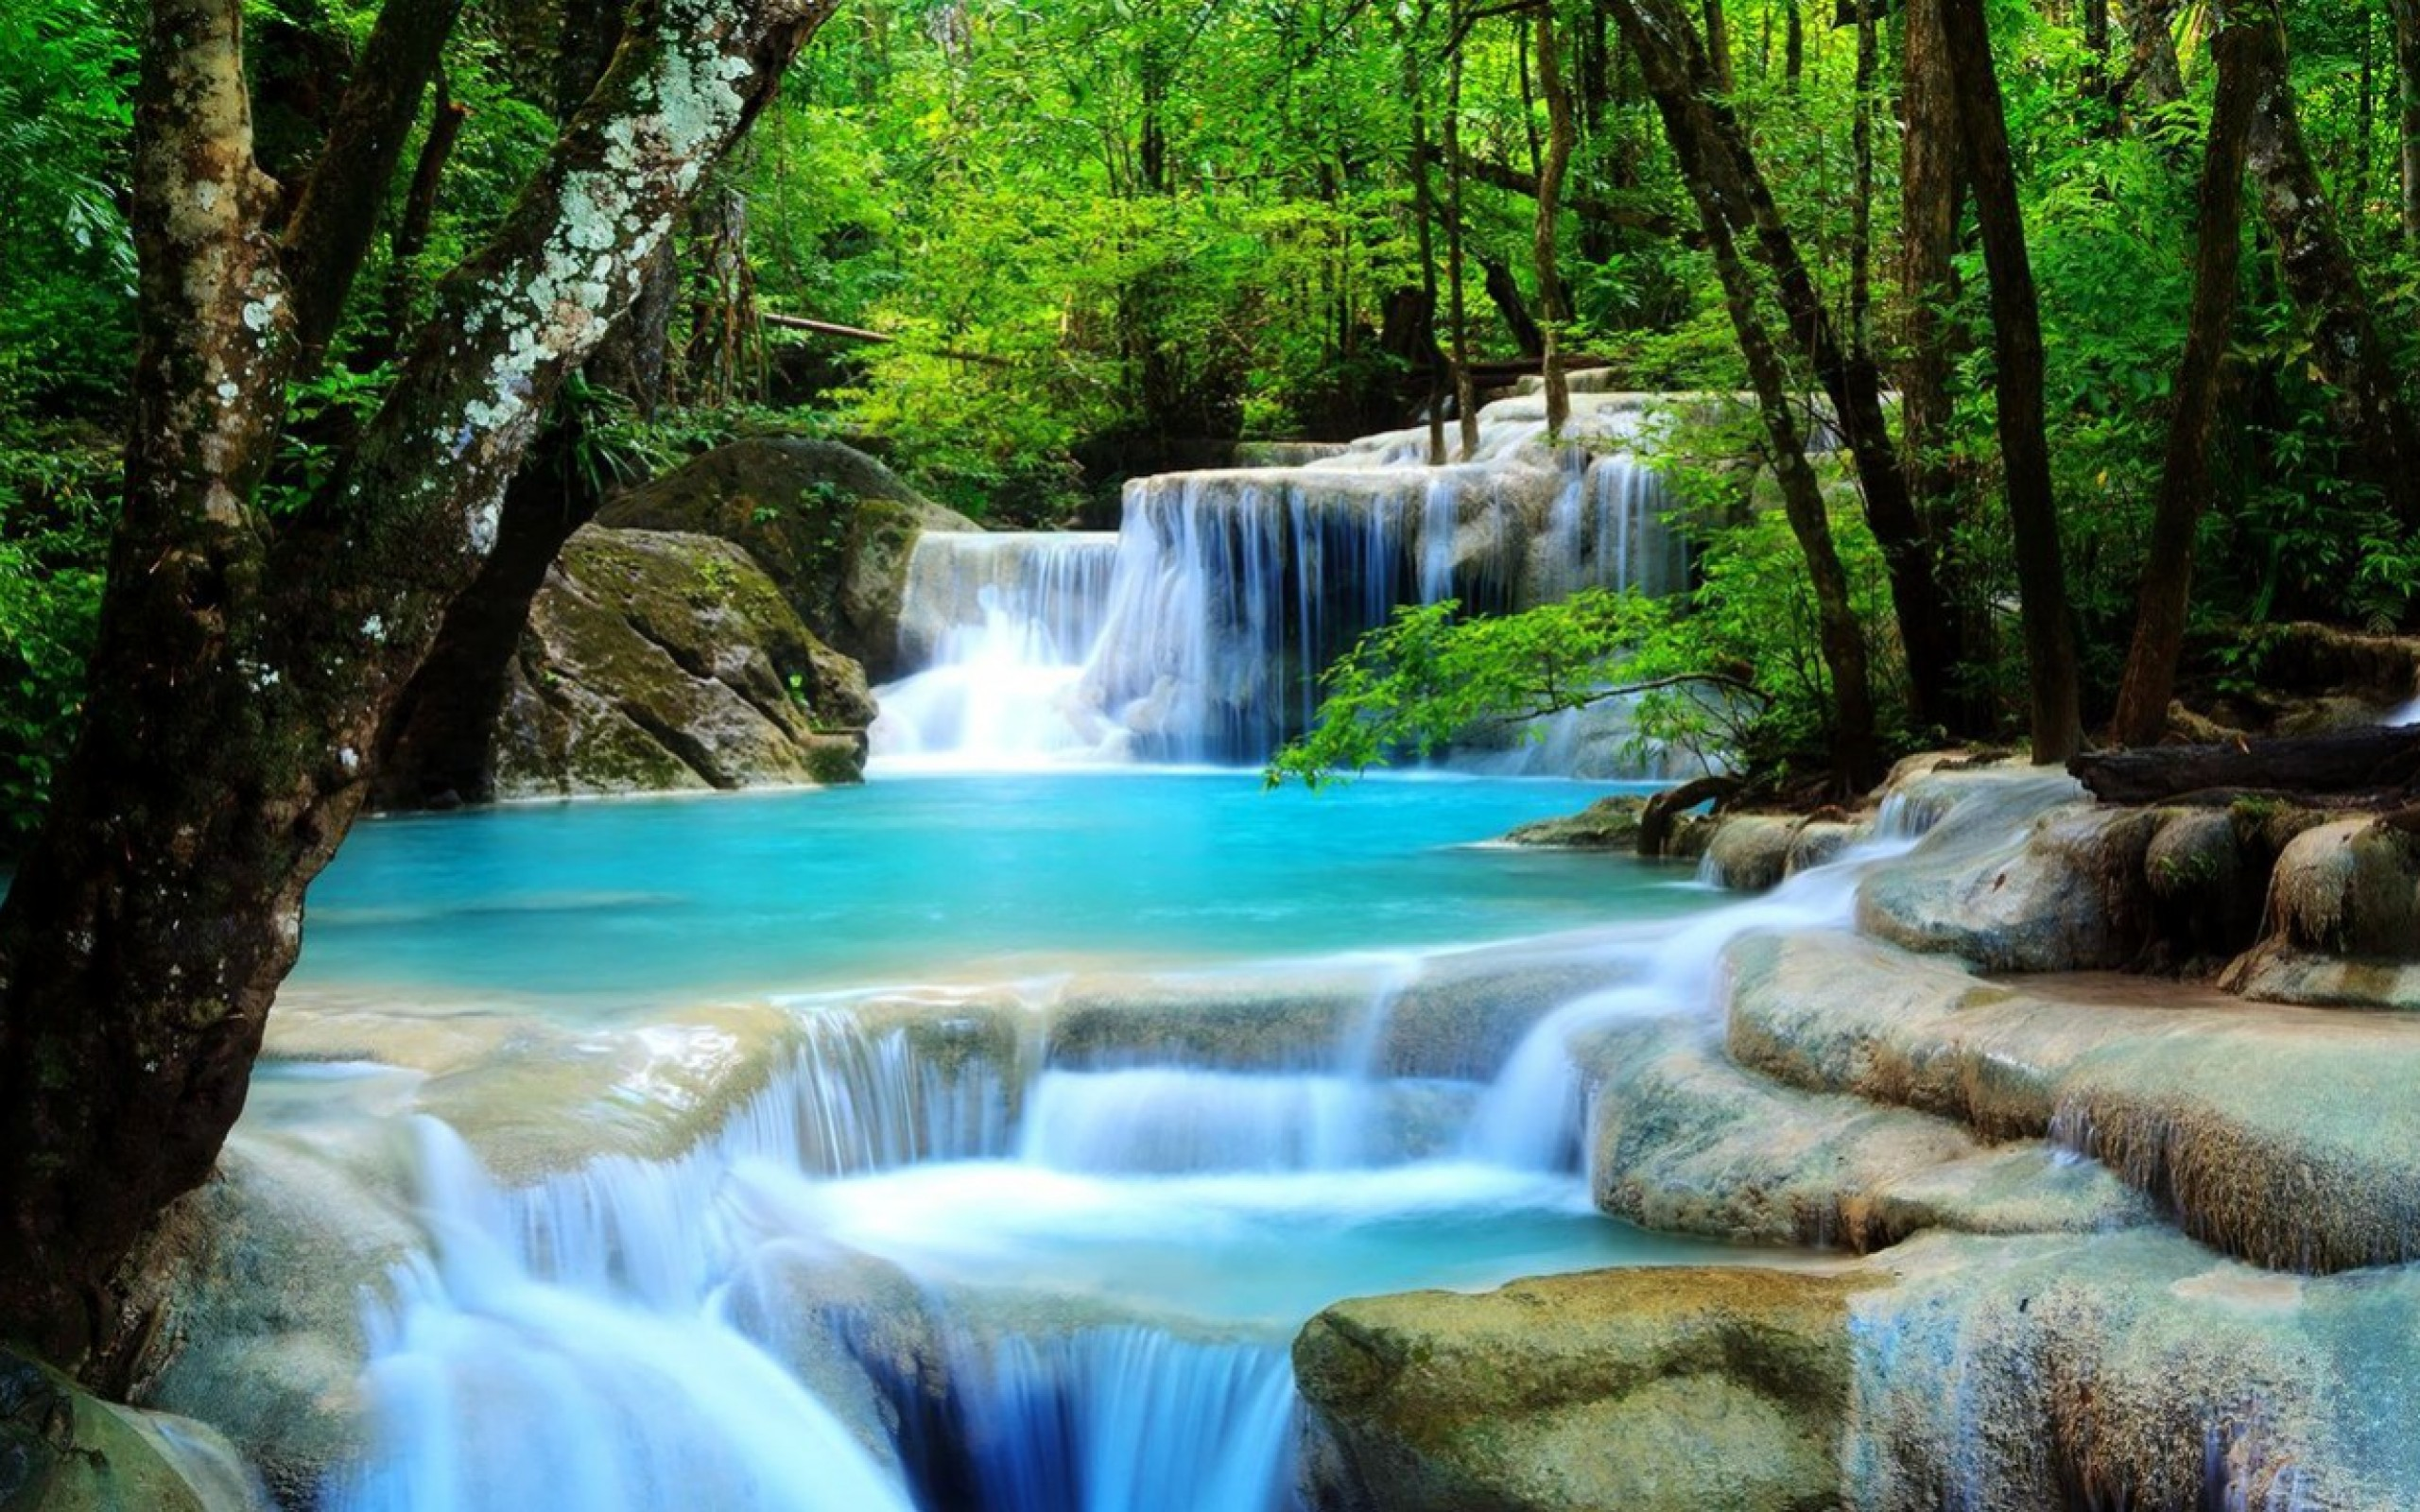 50 ] Live Wallpaper Of Waterfalls On WallpaperSafari